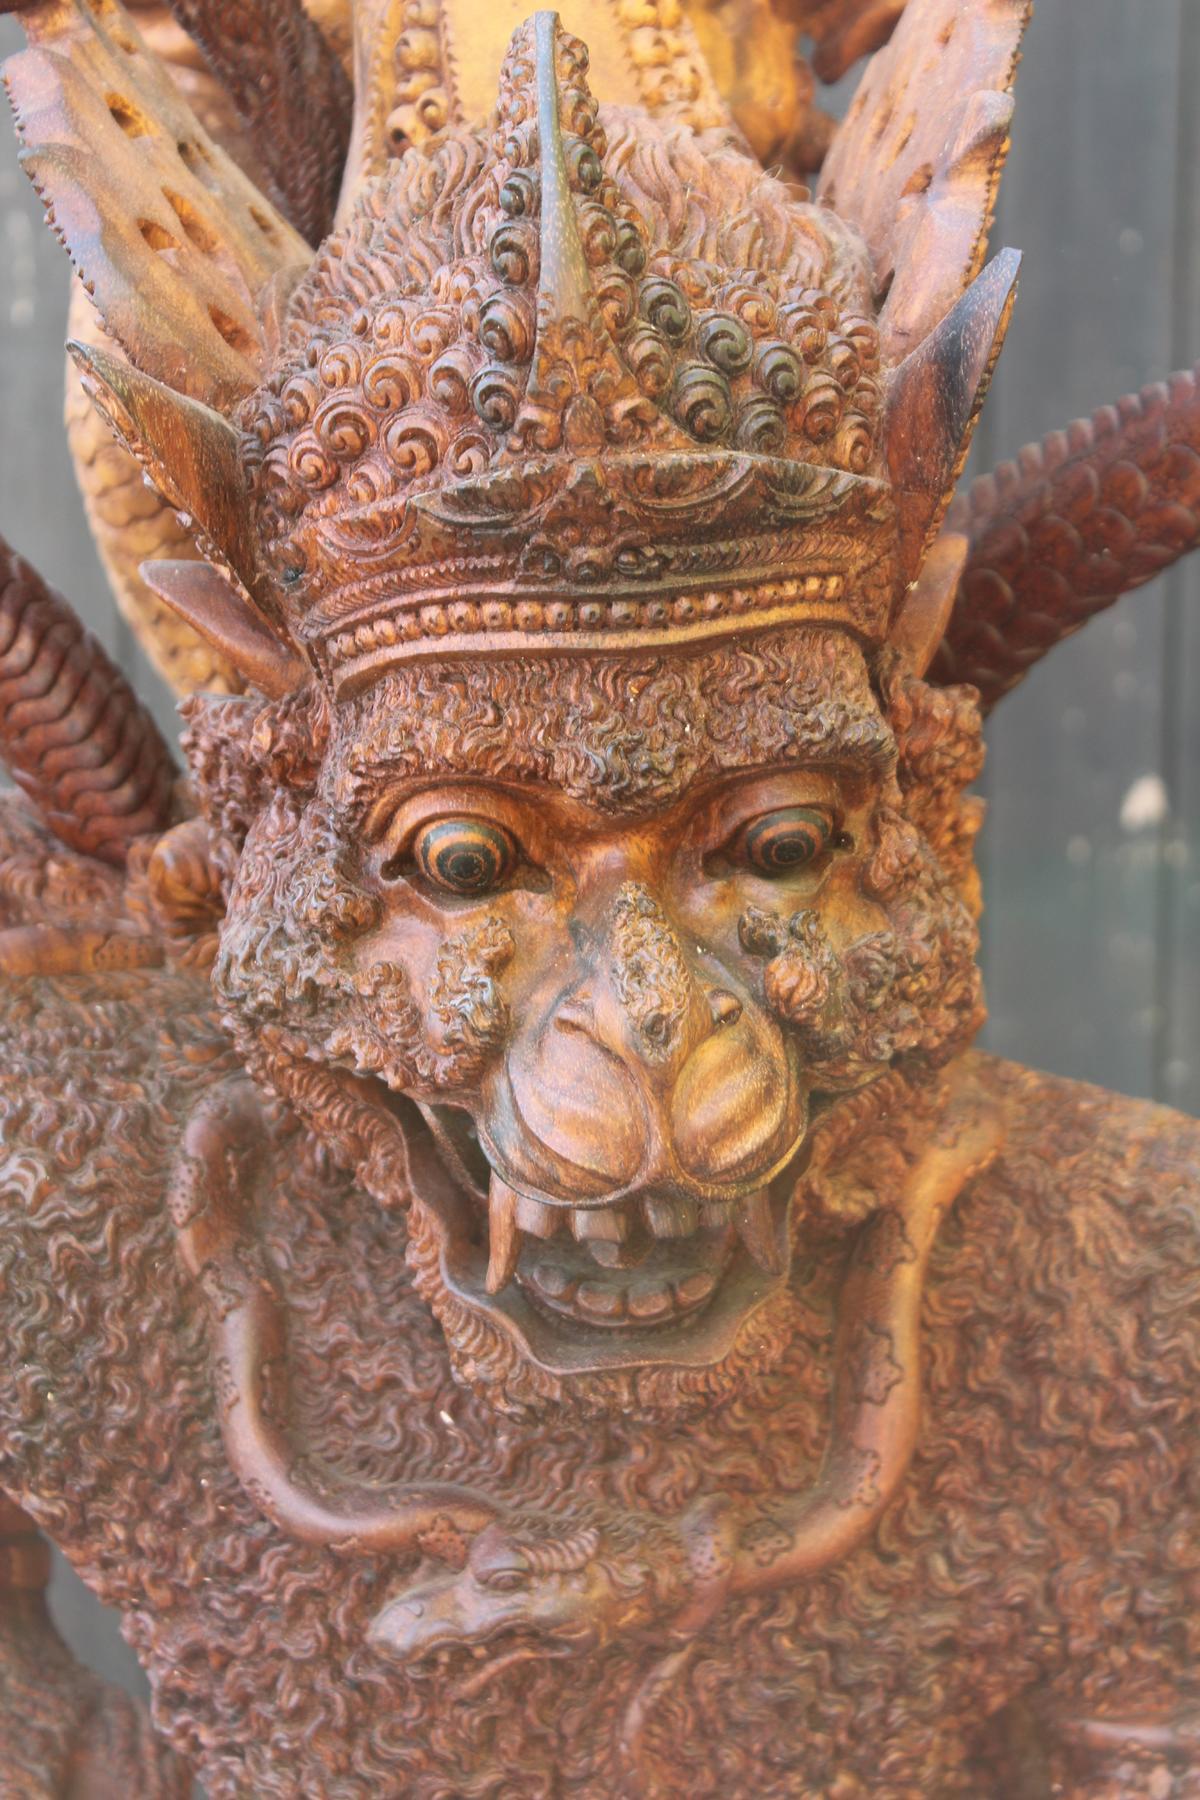 Große Holzskulptur, Indonesien / Bali, 2. Hälfte 20. Jahrhundert-4